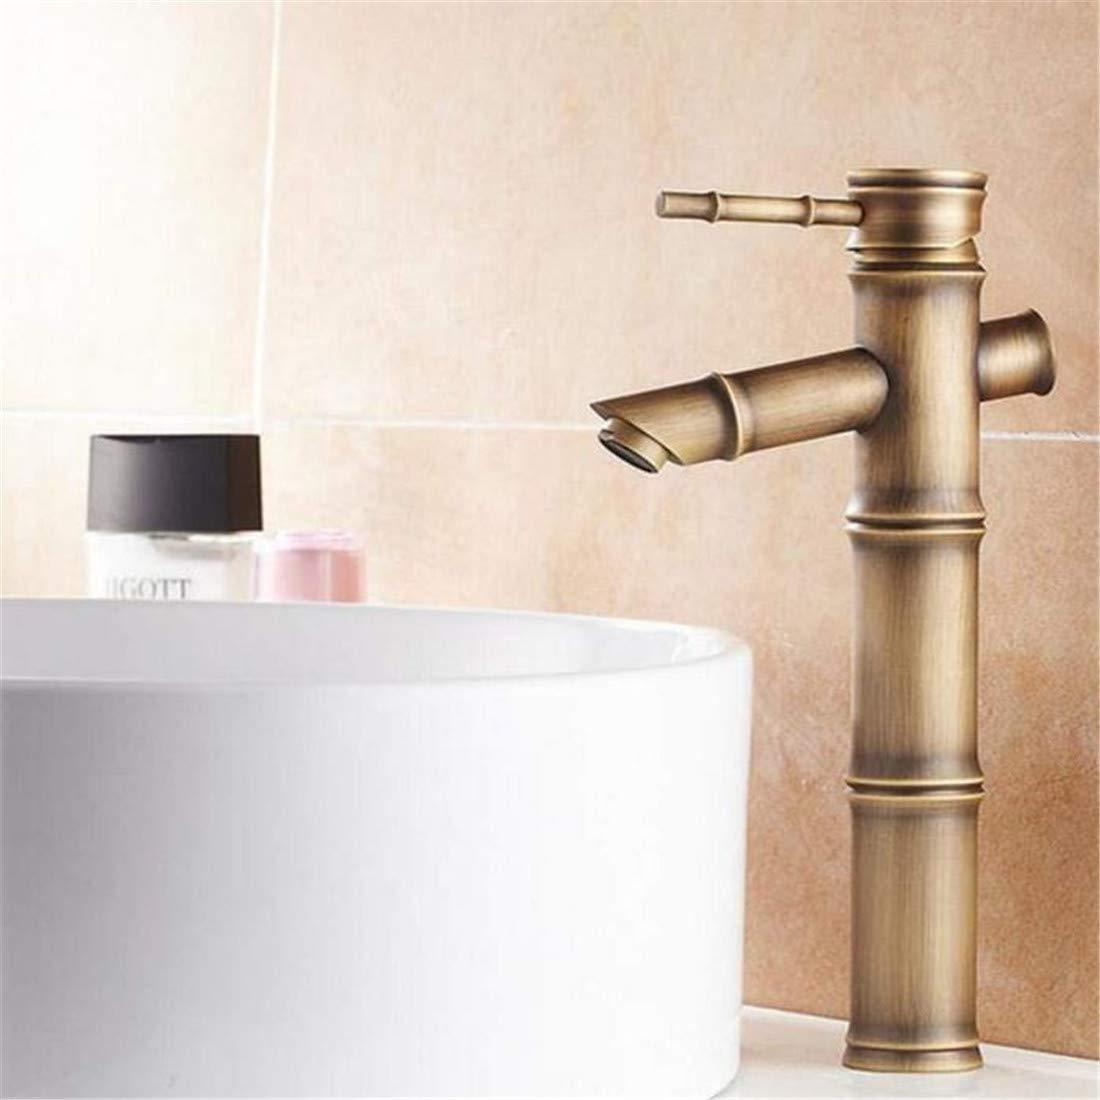 Faucet Retro Kitchen Bathroom Faucet Faucet Washbasin Mixert All Antique Bathroom Faucet Single Handle Bamboo Water Tap